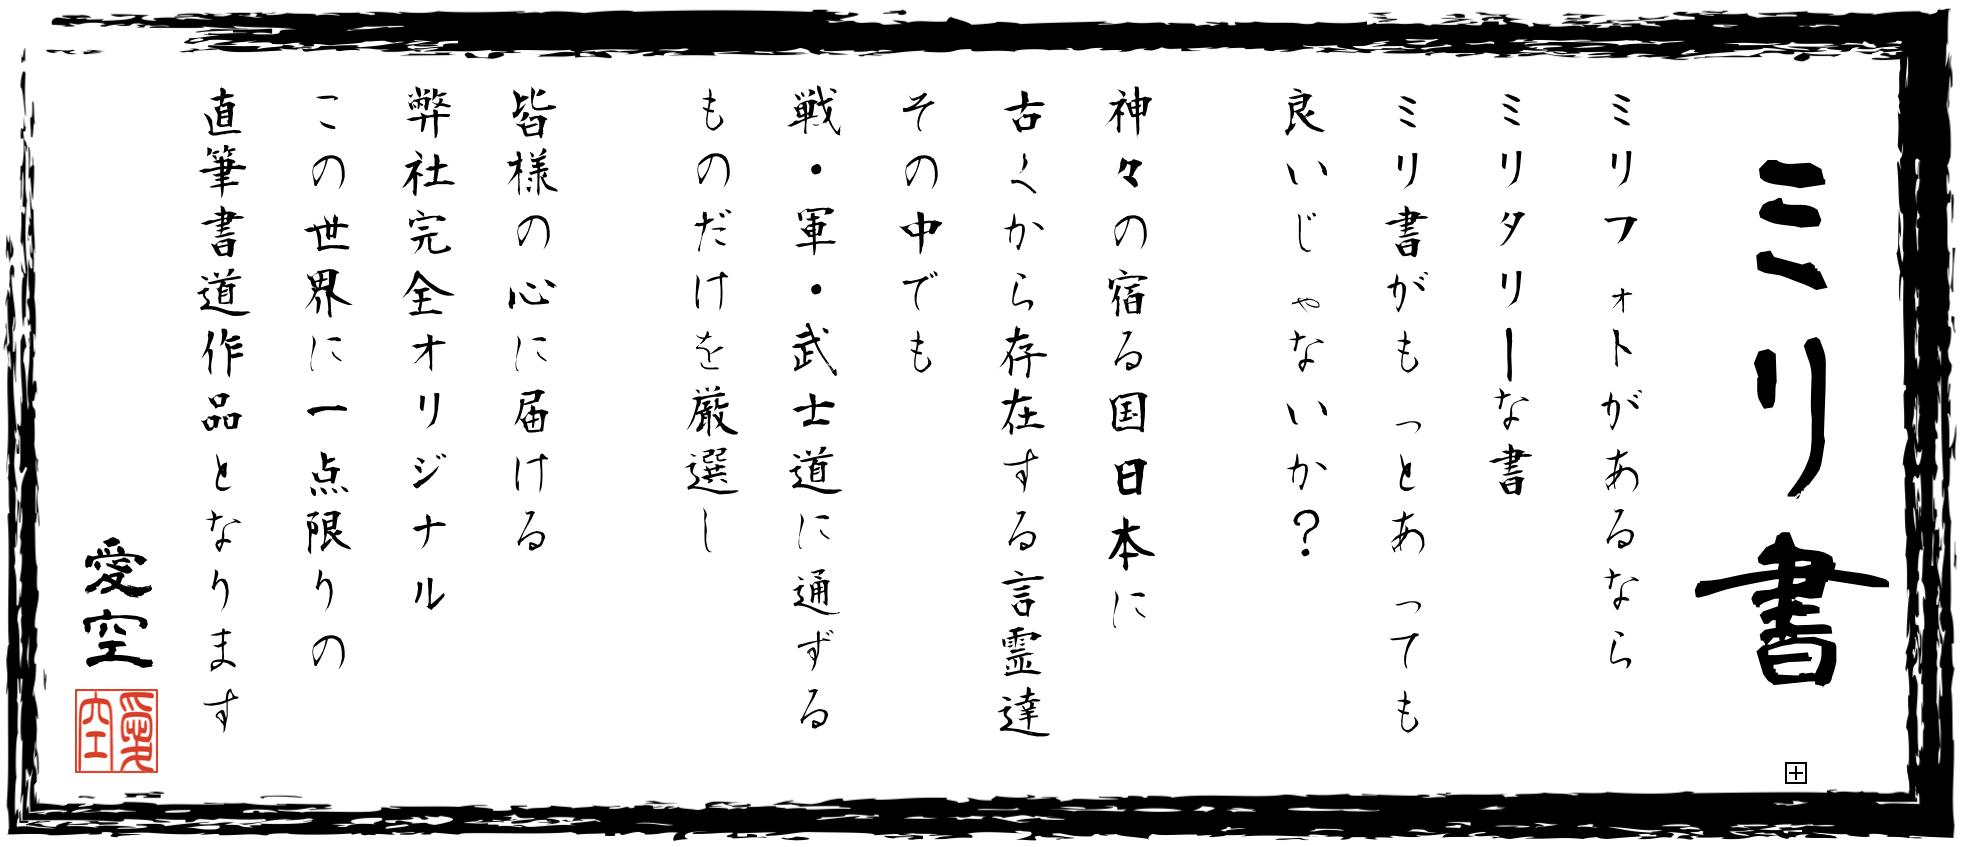 ISKYDEPOミリ書ミリタリー書道愛空